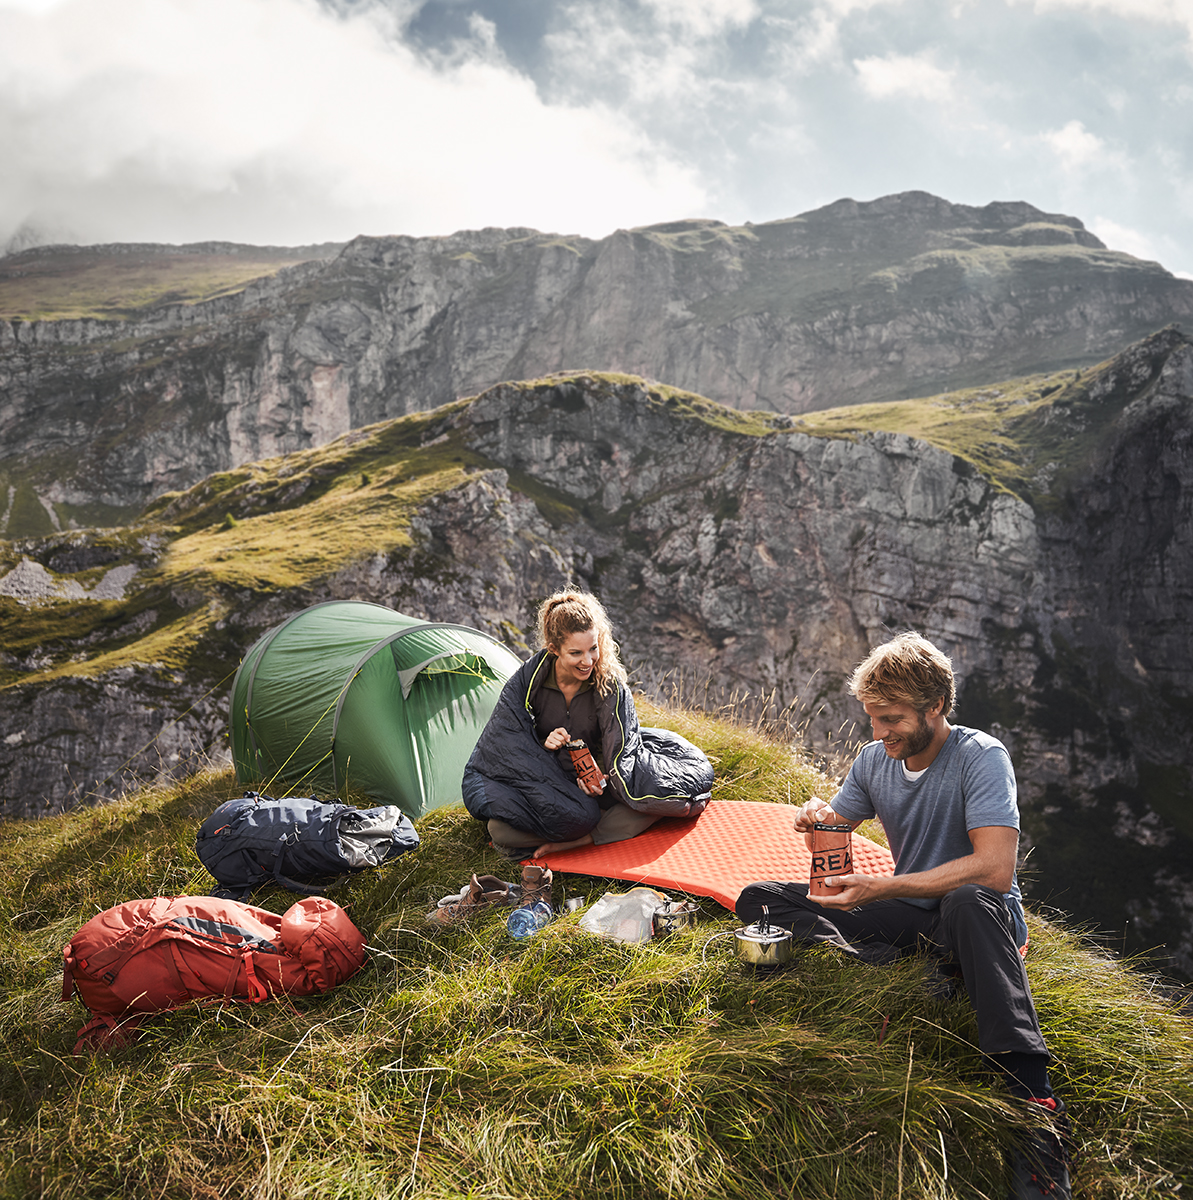 Tatonka-Abisko-Trekkingzelt-im-Einsatz-auf-Reisen